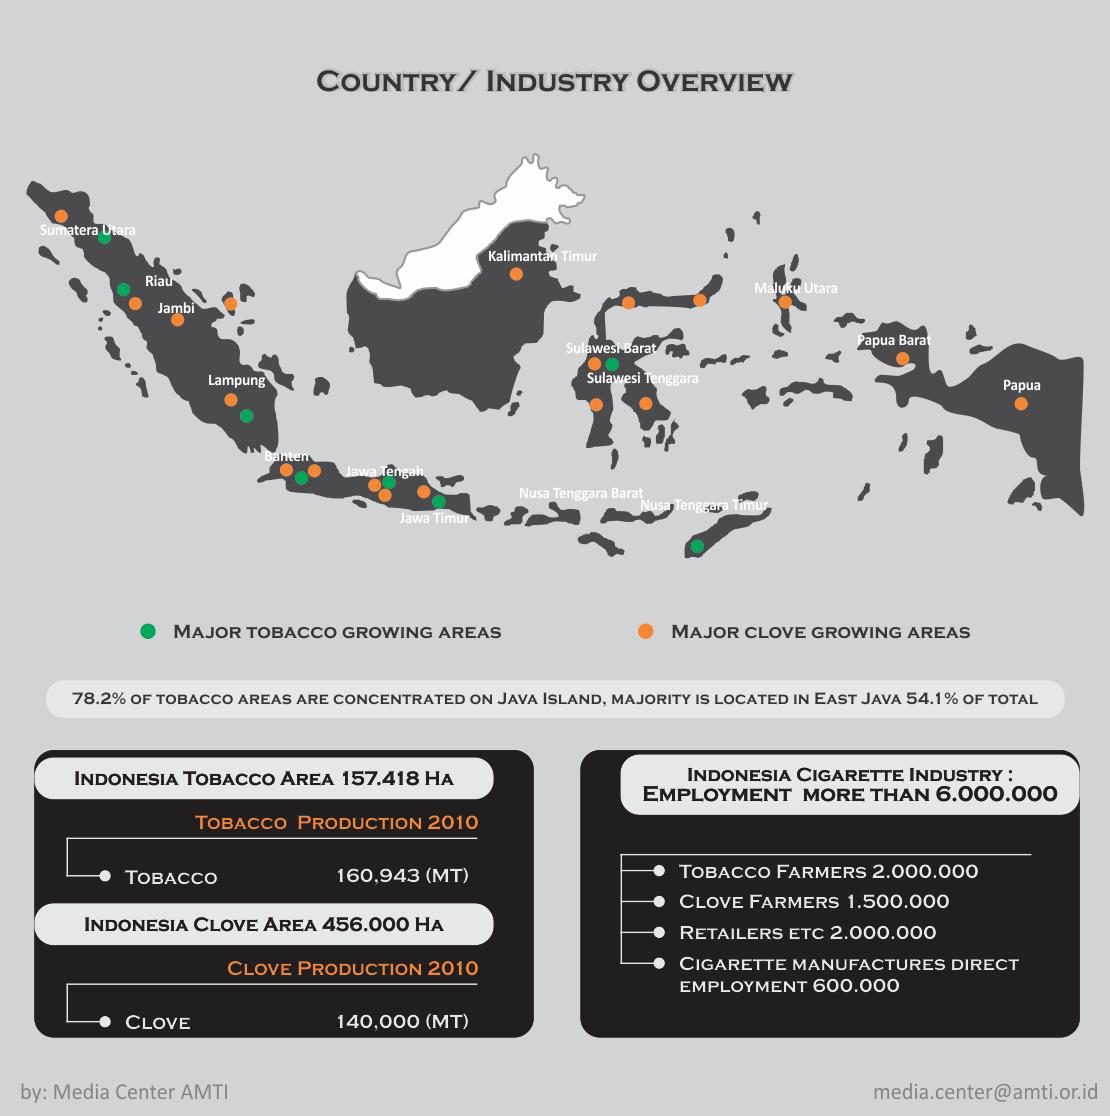 Source: Indonesia Tobacco Society Alliance (Aliansi Masyarakat Tembakau Indonesia)